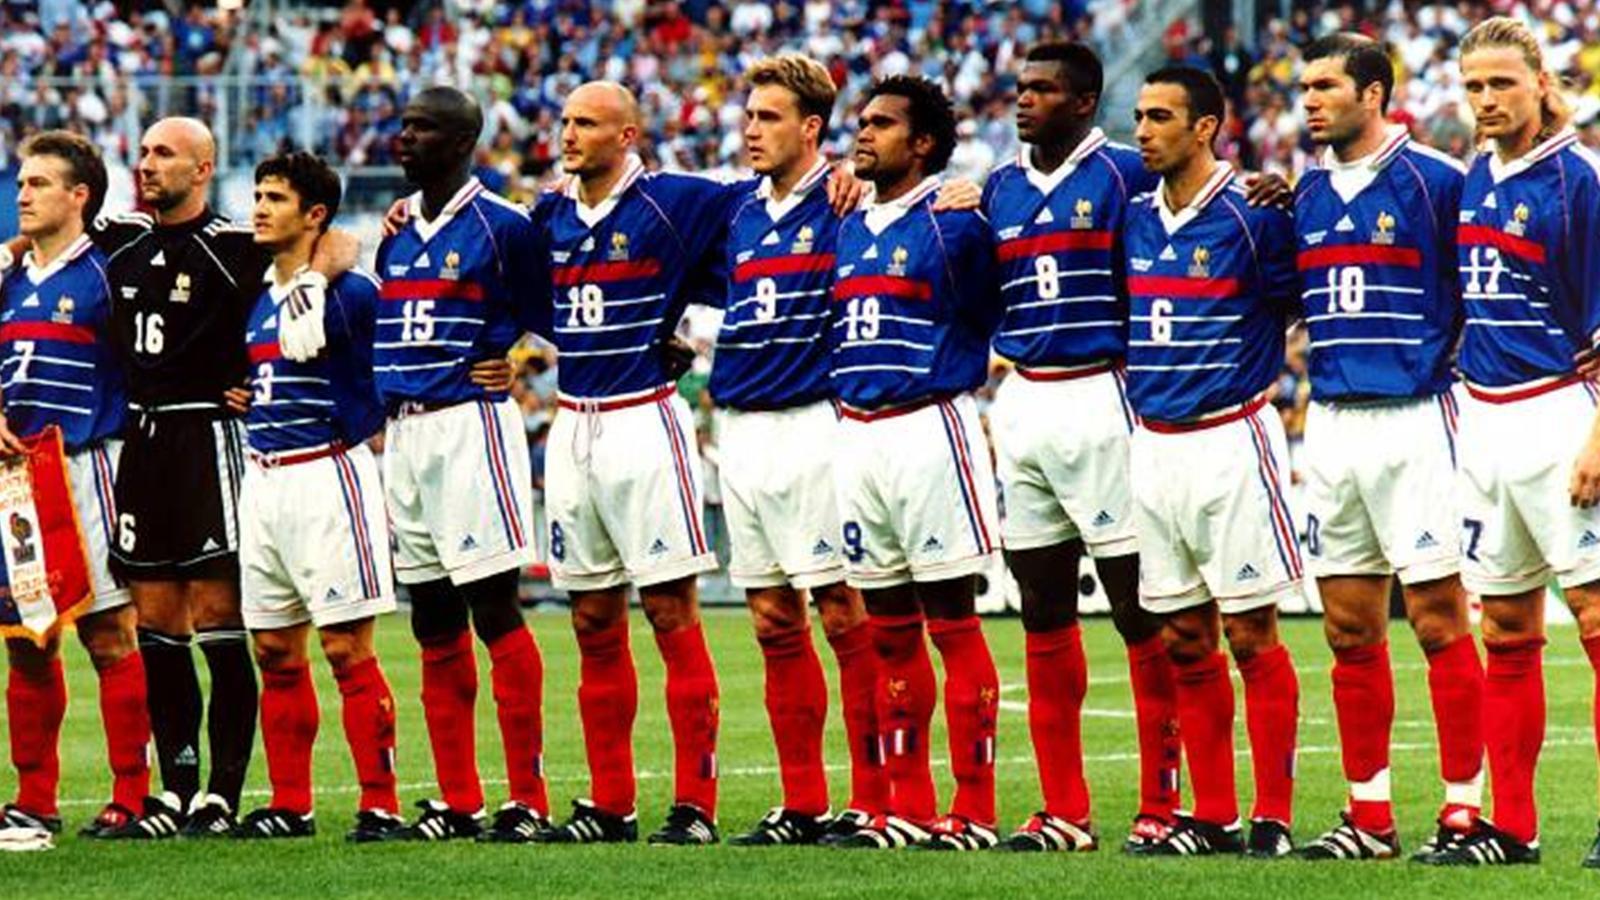 Que sont ils devenus 1 france 98 1998 football eurosport - Coupe de france football calendrier ...